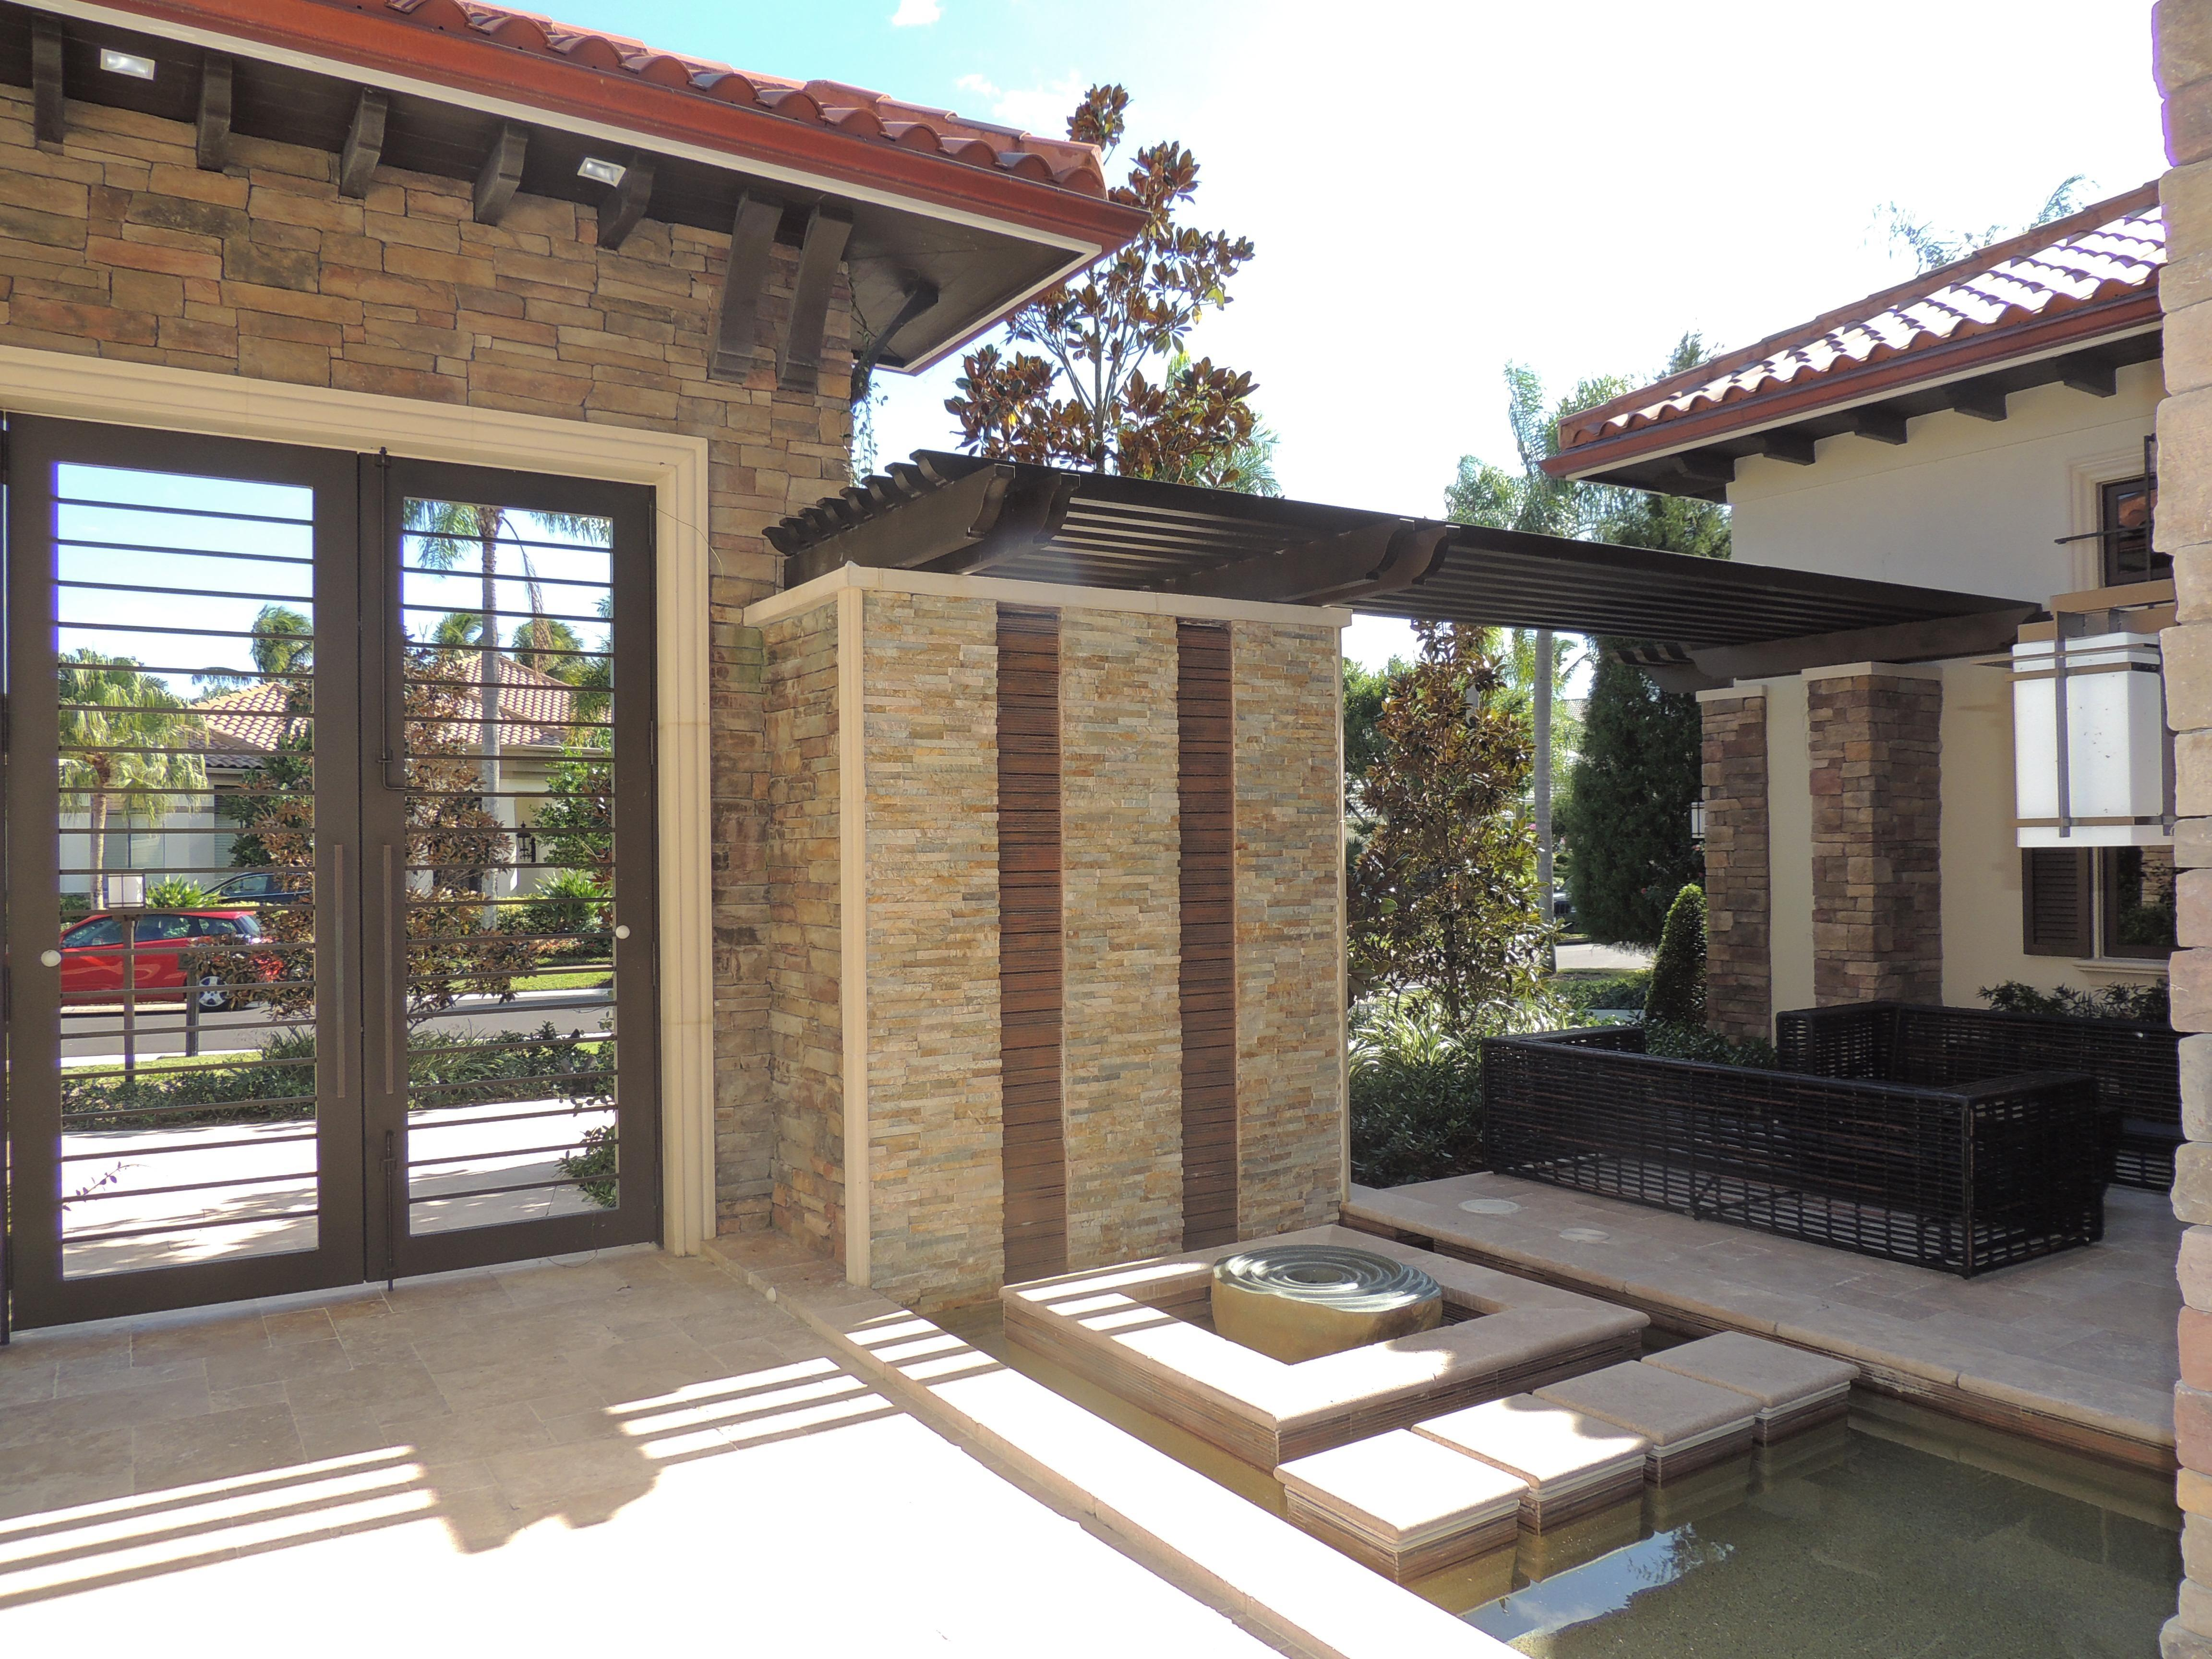 Robelen Hanah Homes LLC image 2